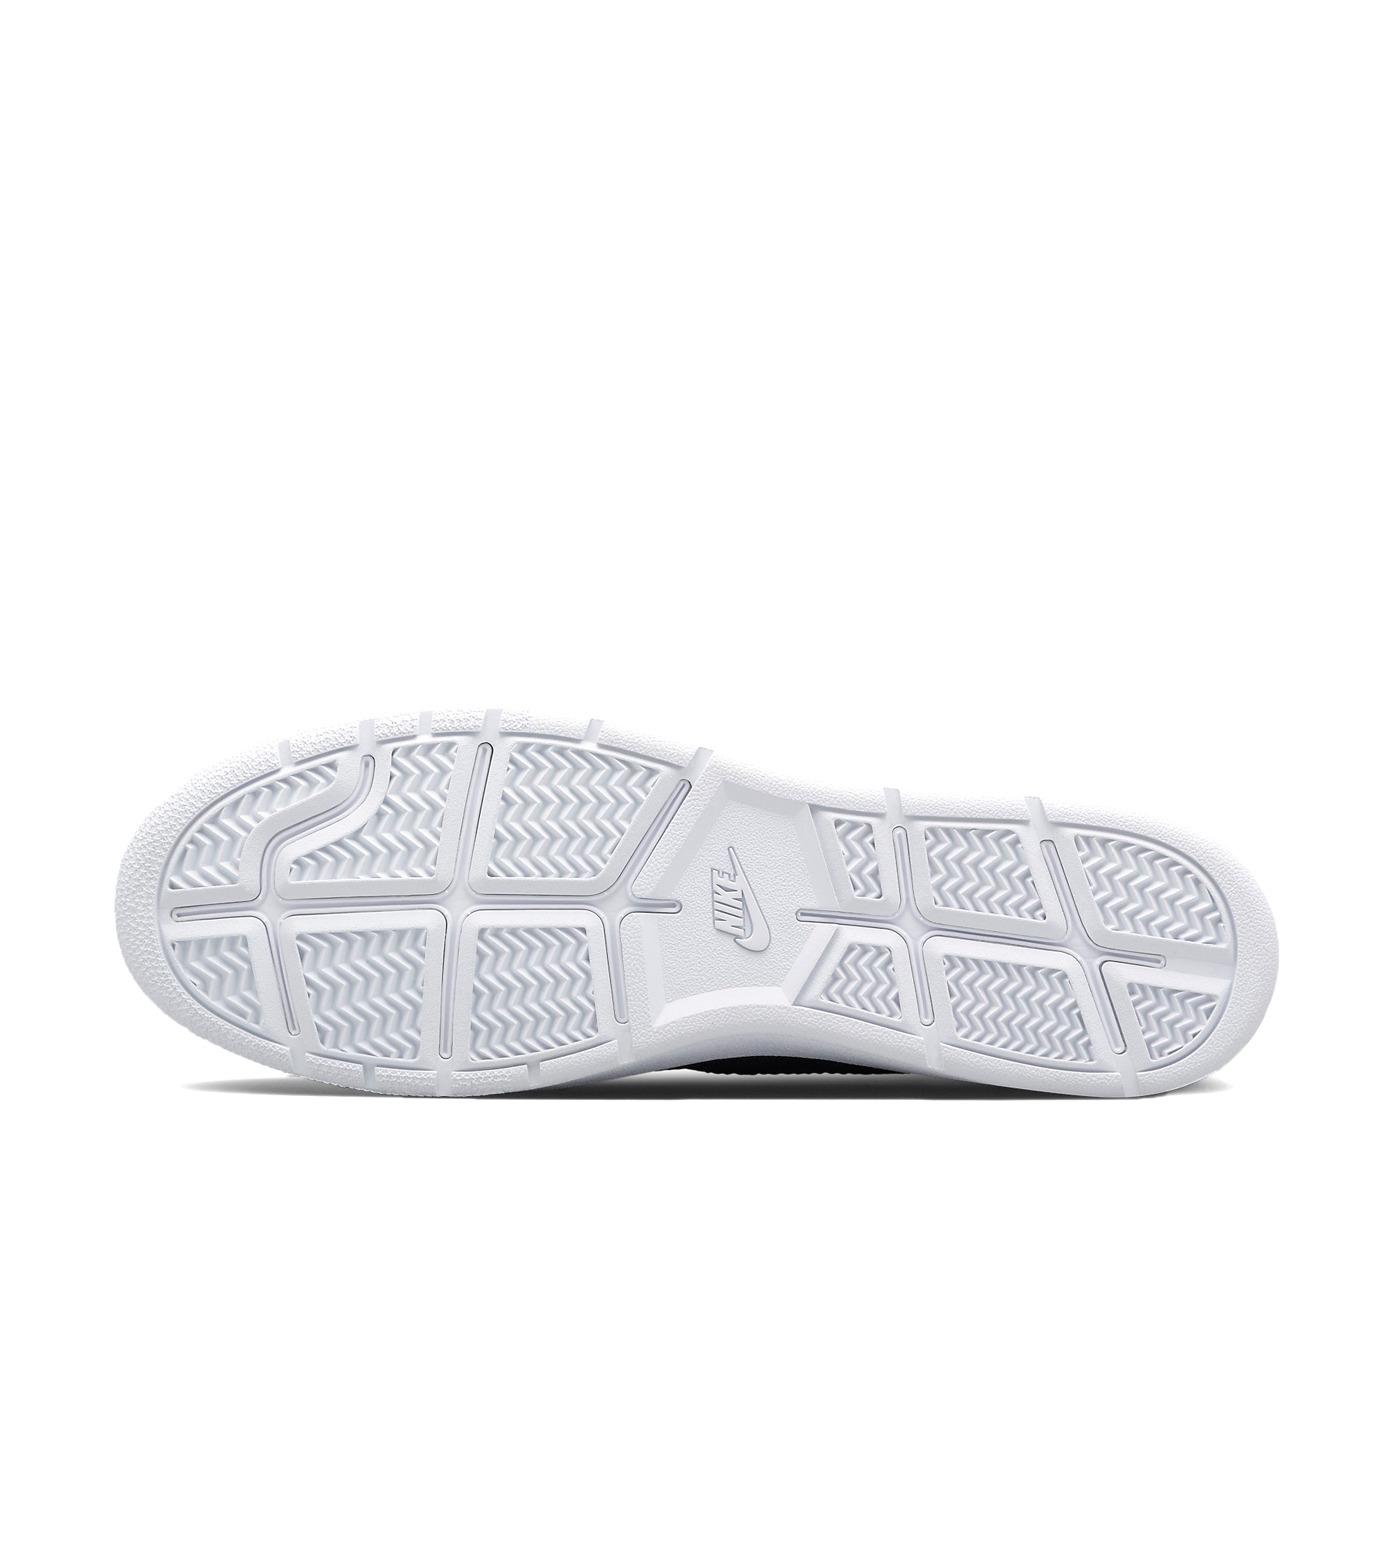 NIKE(ナイキ)のCOURT TENNIS CLASSIC ULTRA FLYKNIT X RF-NAVY(シューズ/shoes)-836360-401-93 拡大詳細画像2